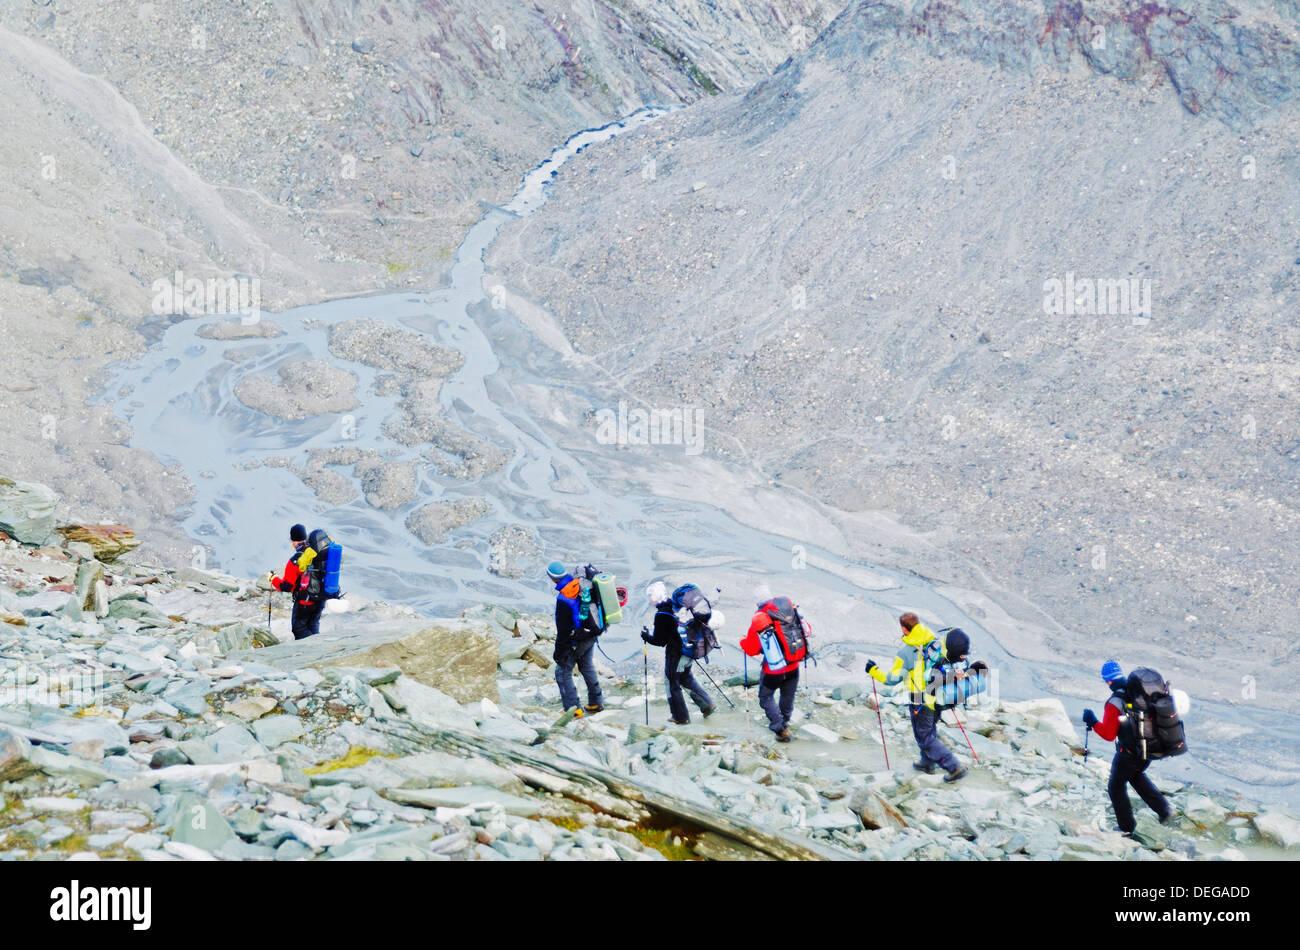 Hikers on the Matterhorn, Zermatt, Valais, Swiss Alps, Switzerland, Europe - Stock Image